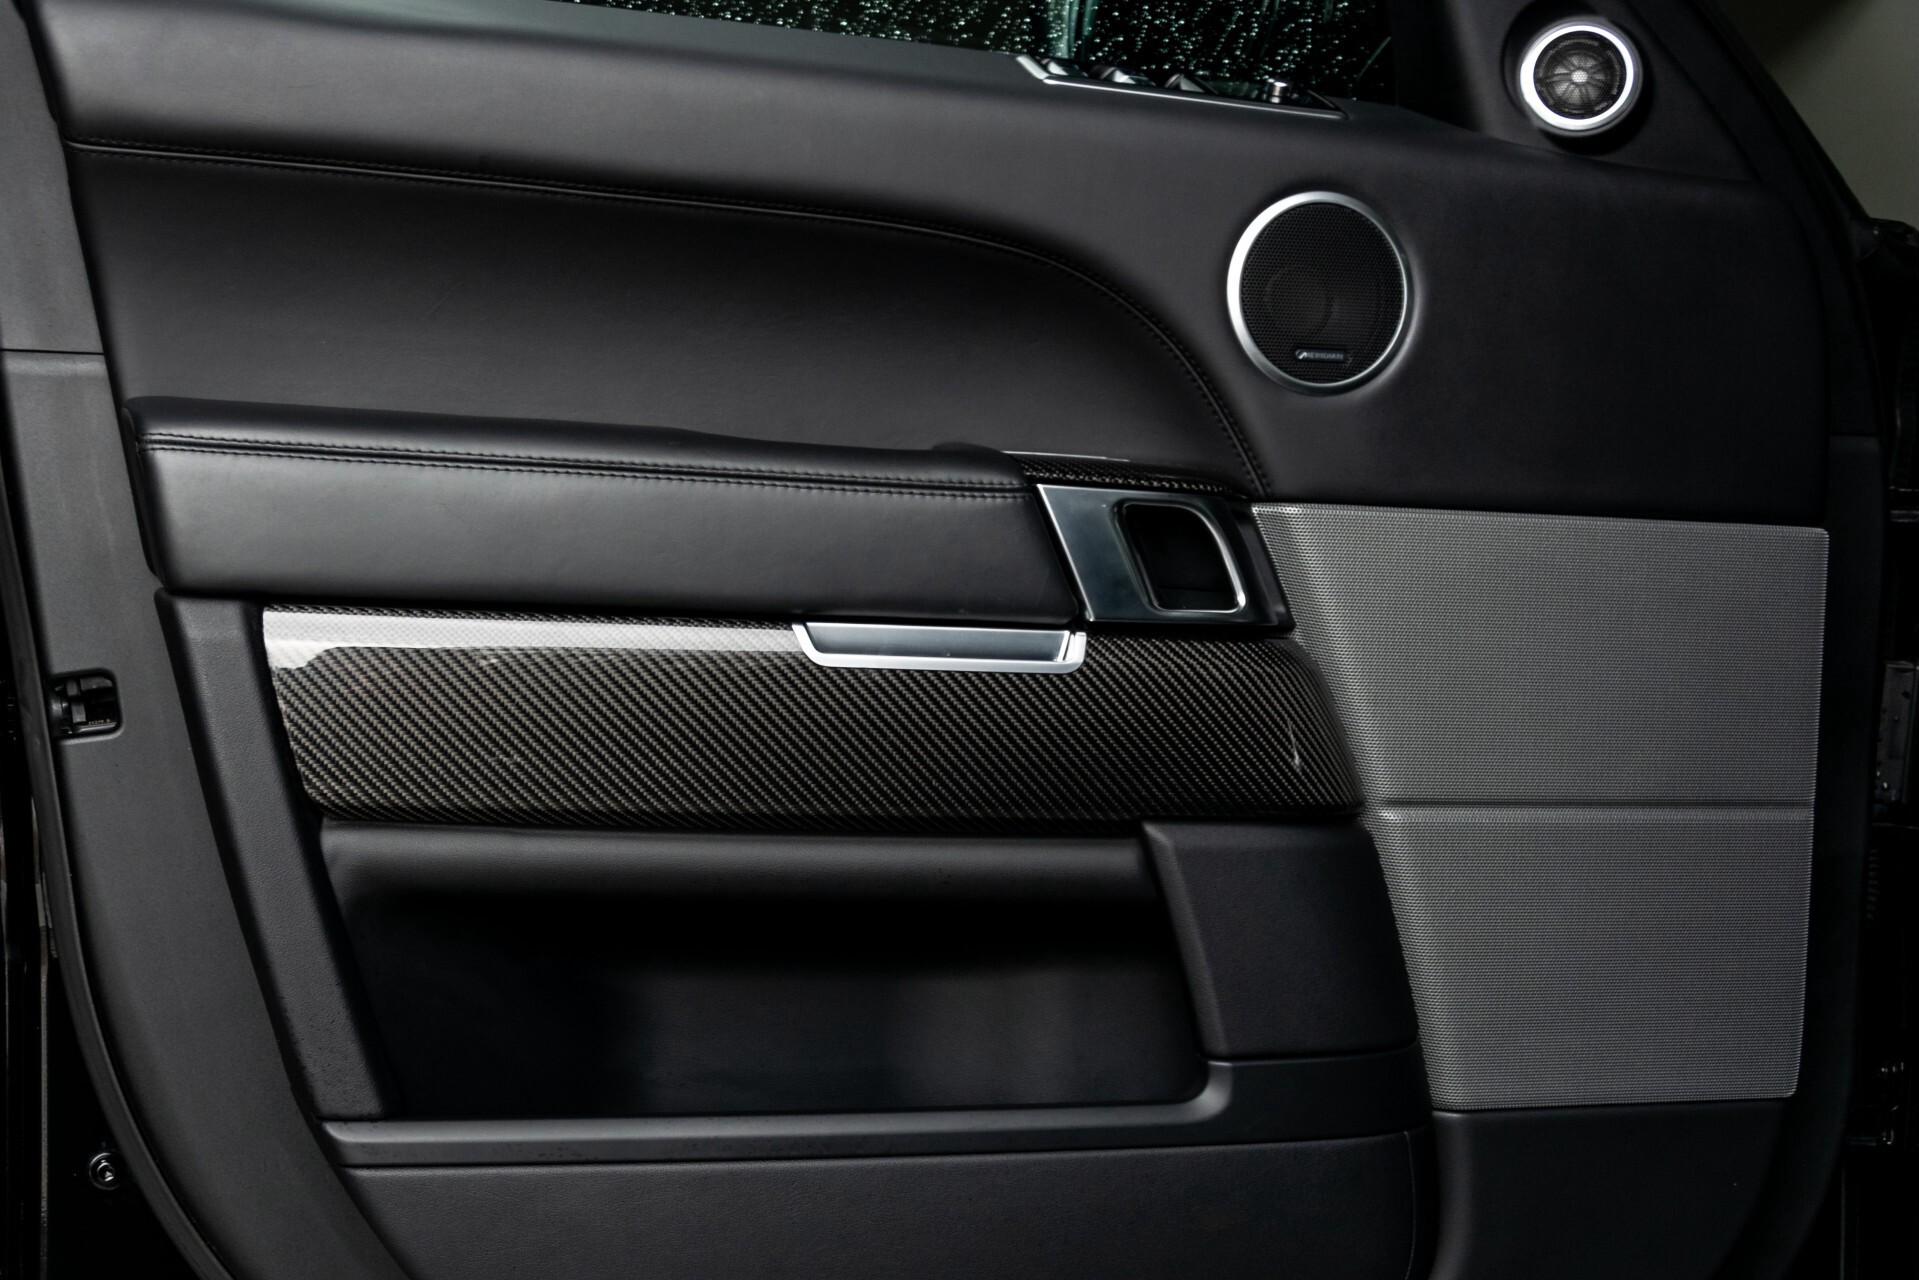 Land Rover Range Rover Sport SVR 5.0 Supercharged 575pk Full Carbon Nieuwprijs €241377 Foto 38